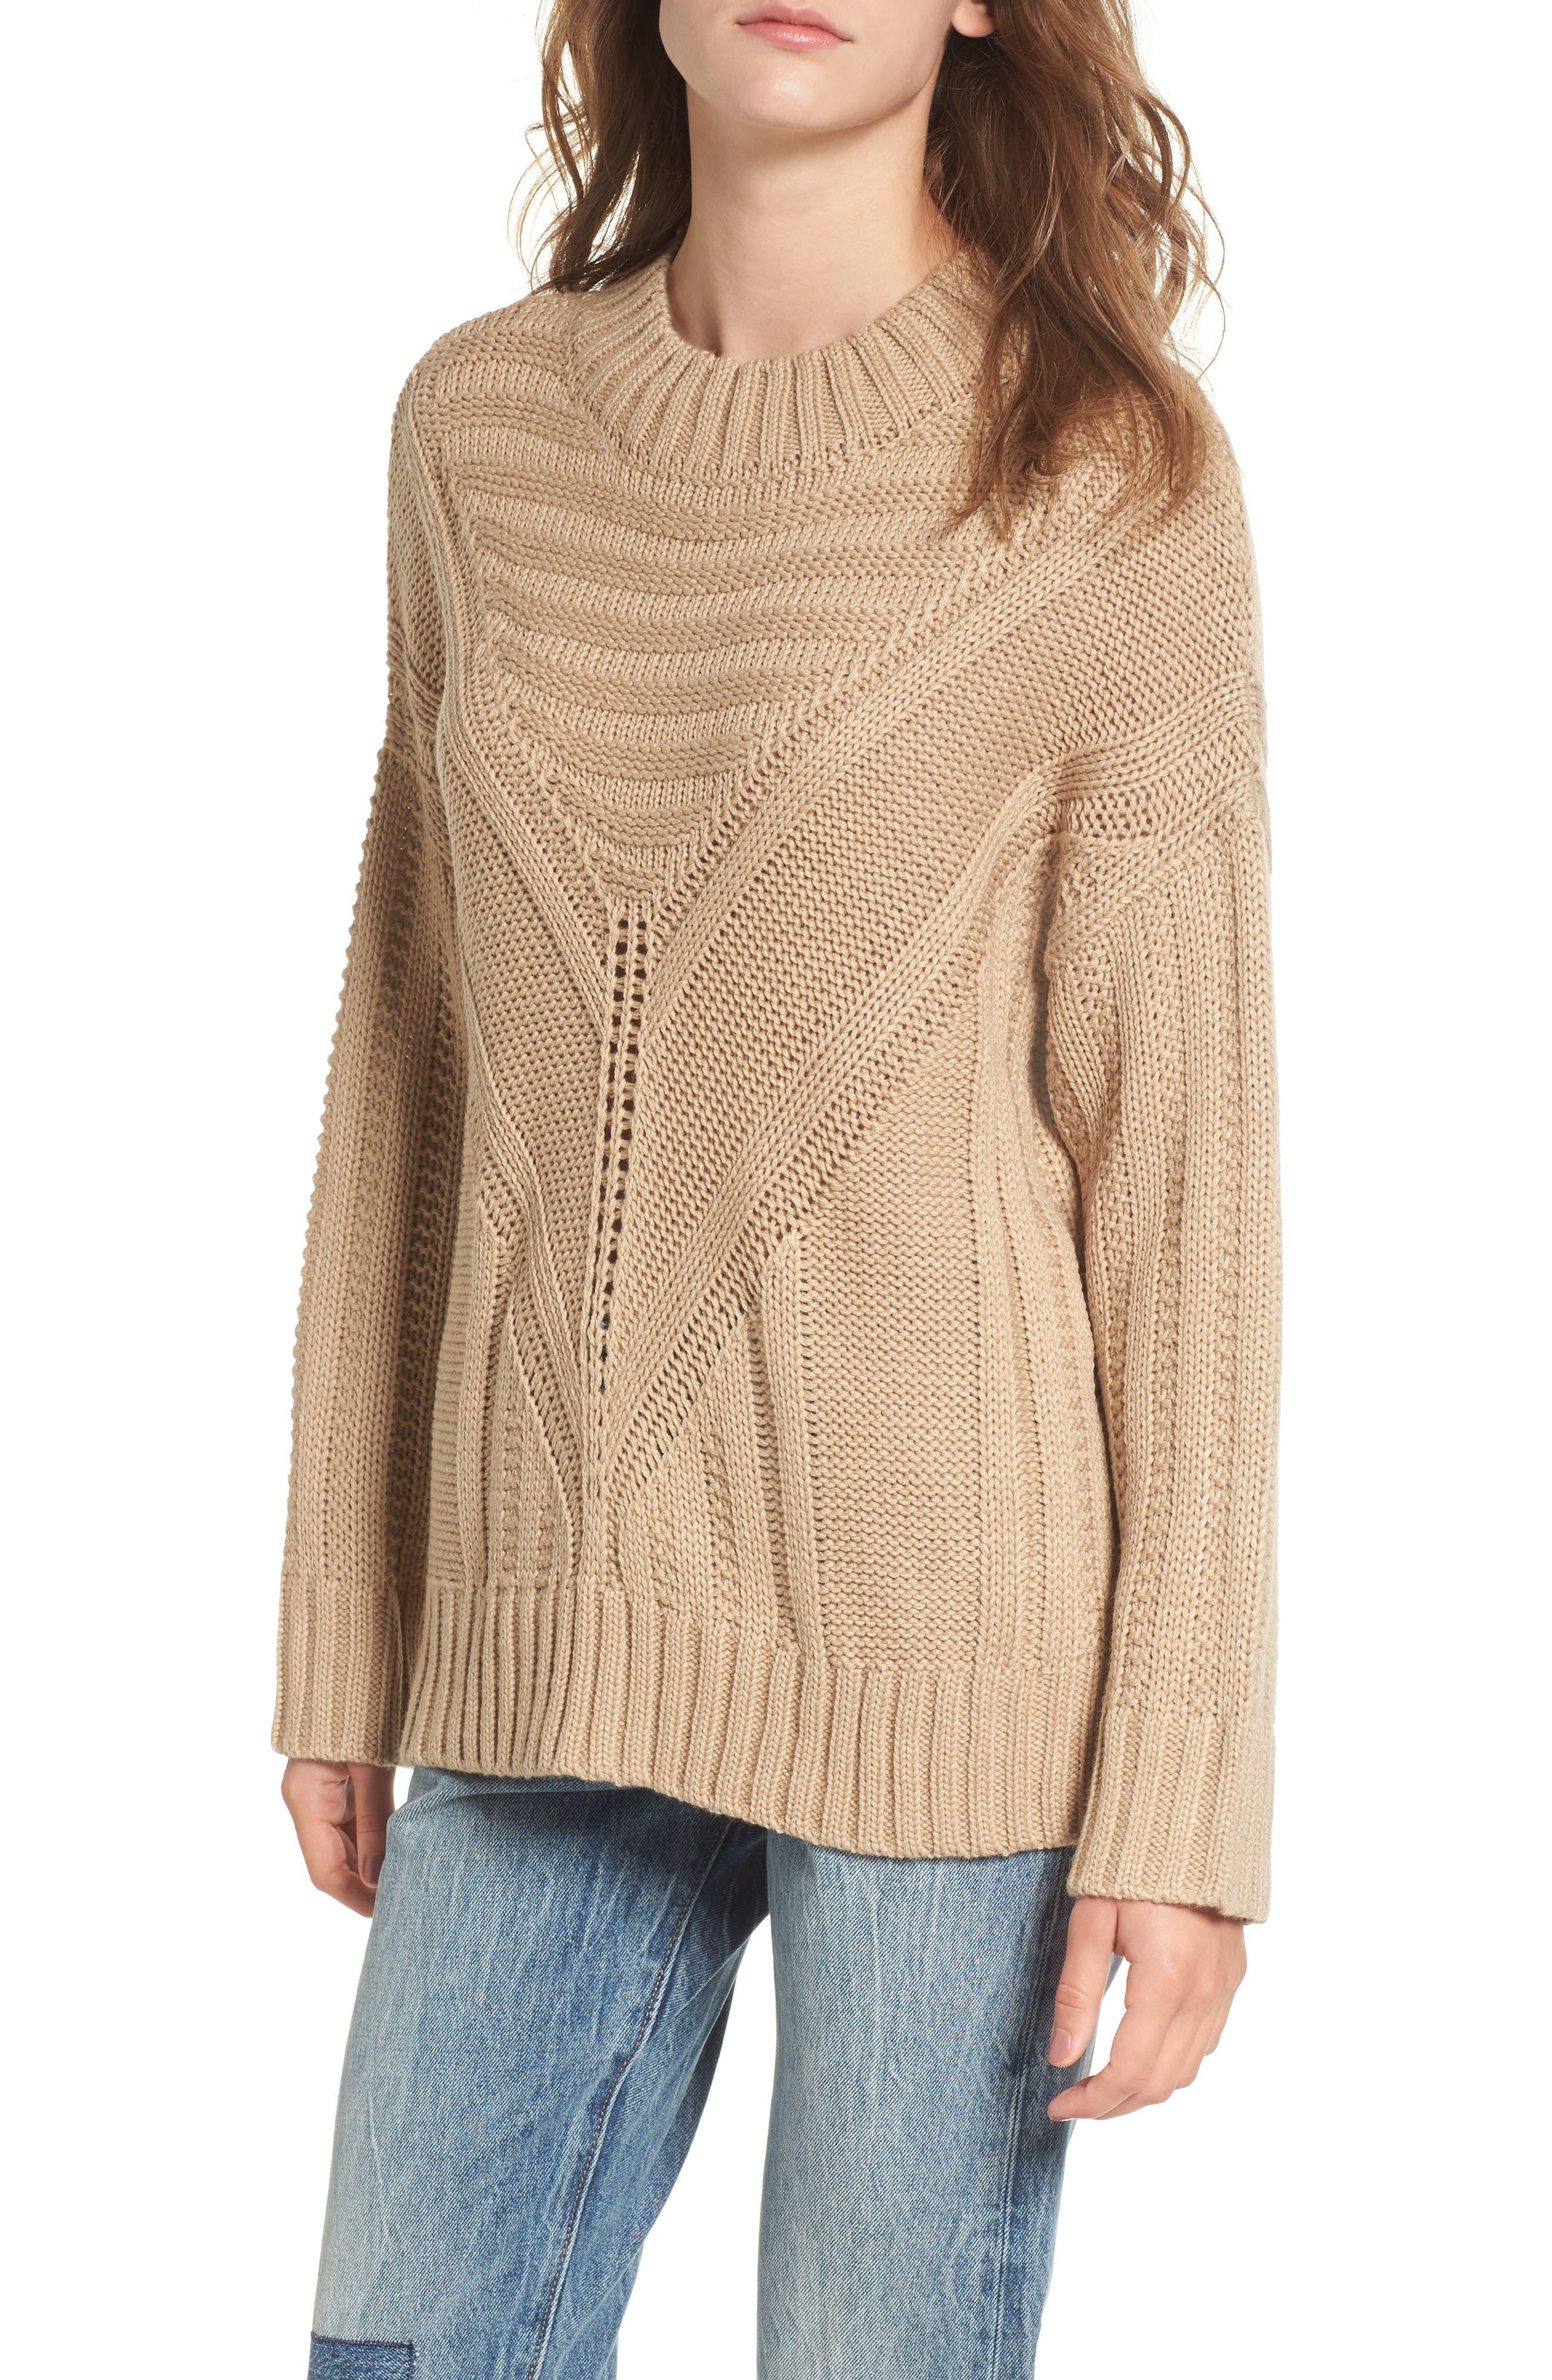 Alternate Image 1 Selected - Moon River Oversize Drop Shoulder Sweater